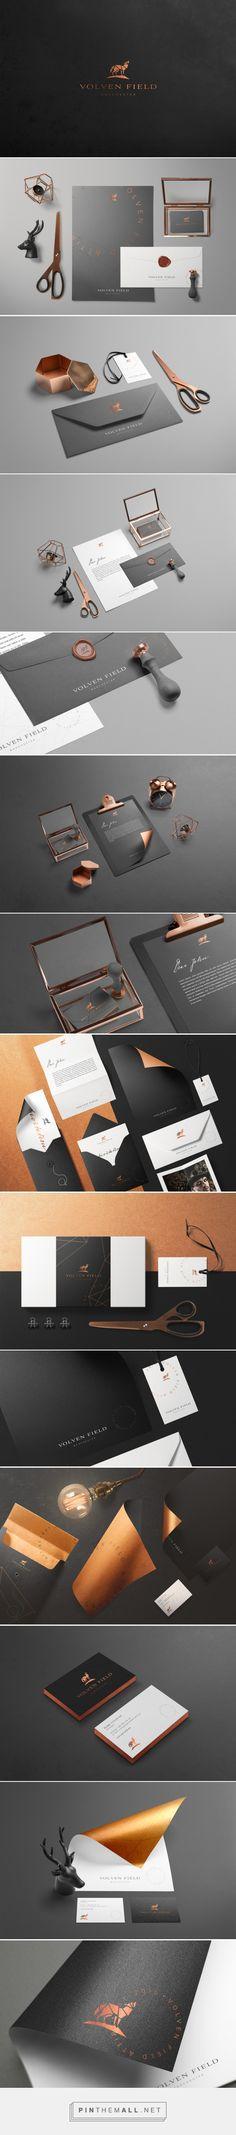 Volven Field Manchester Fashion Designer Branding by Sebastian Bednarek   Fivestar Branding Agency – Design and Branding Agency & Curated Inspiration Gallery